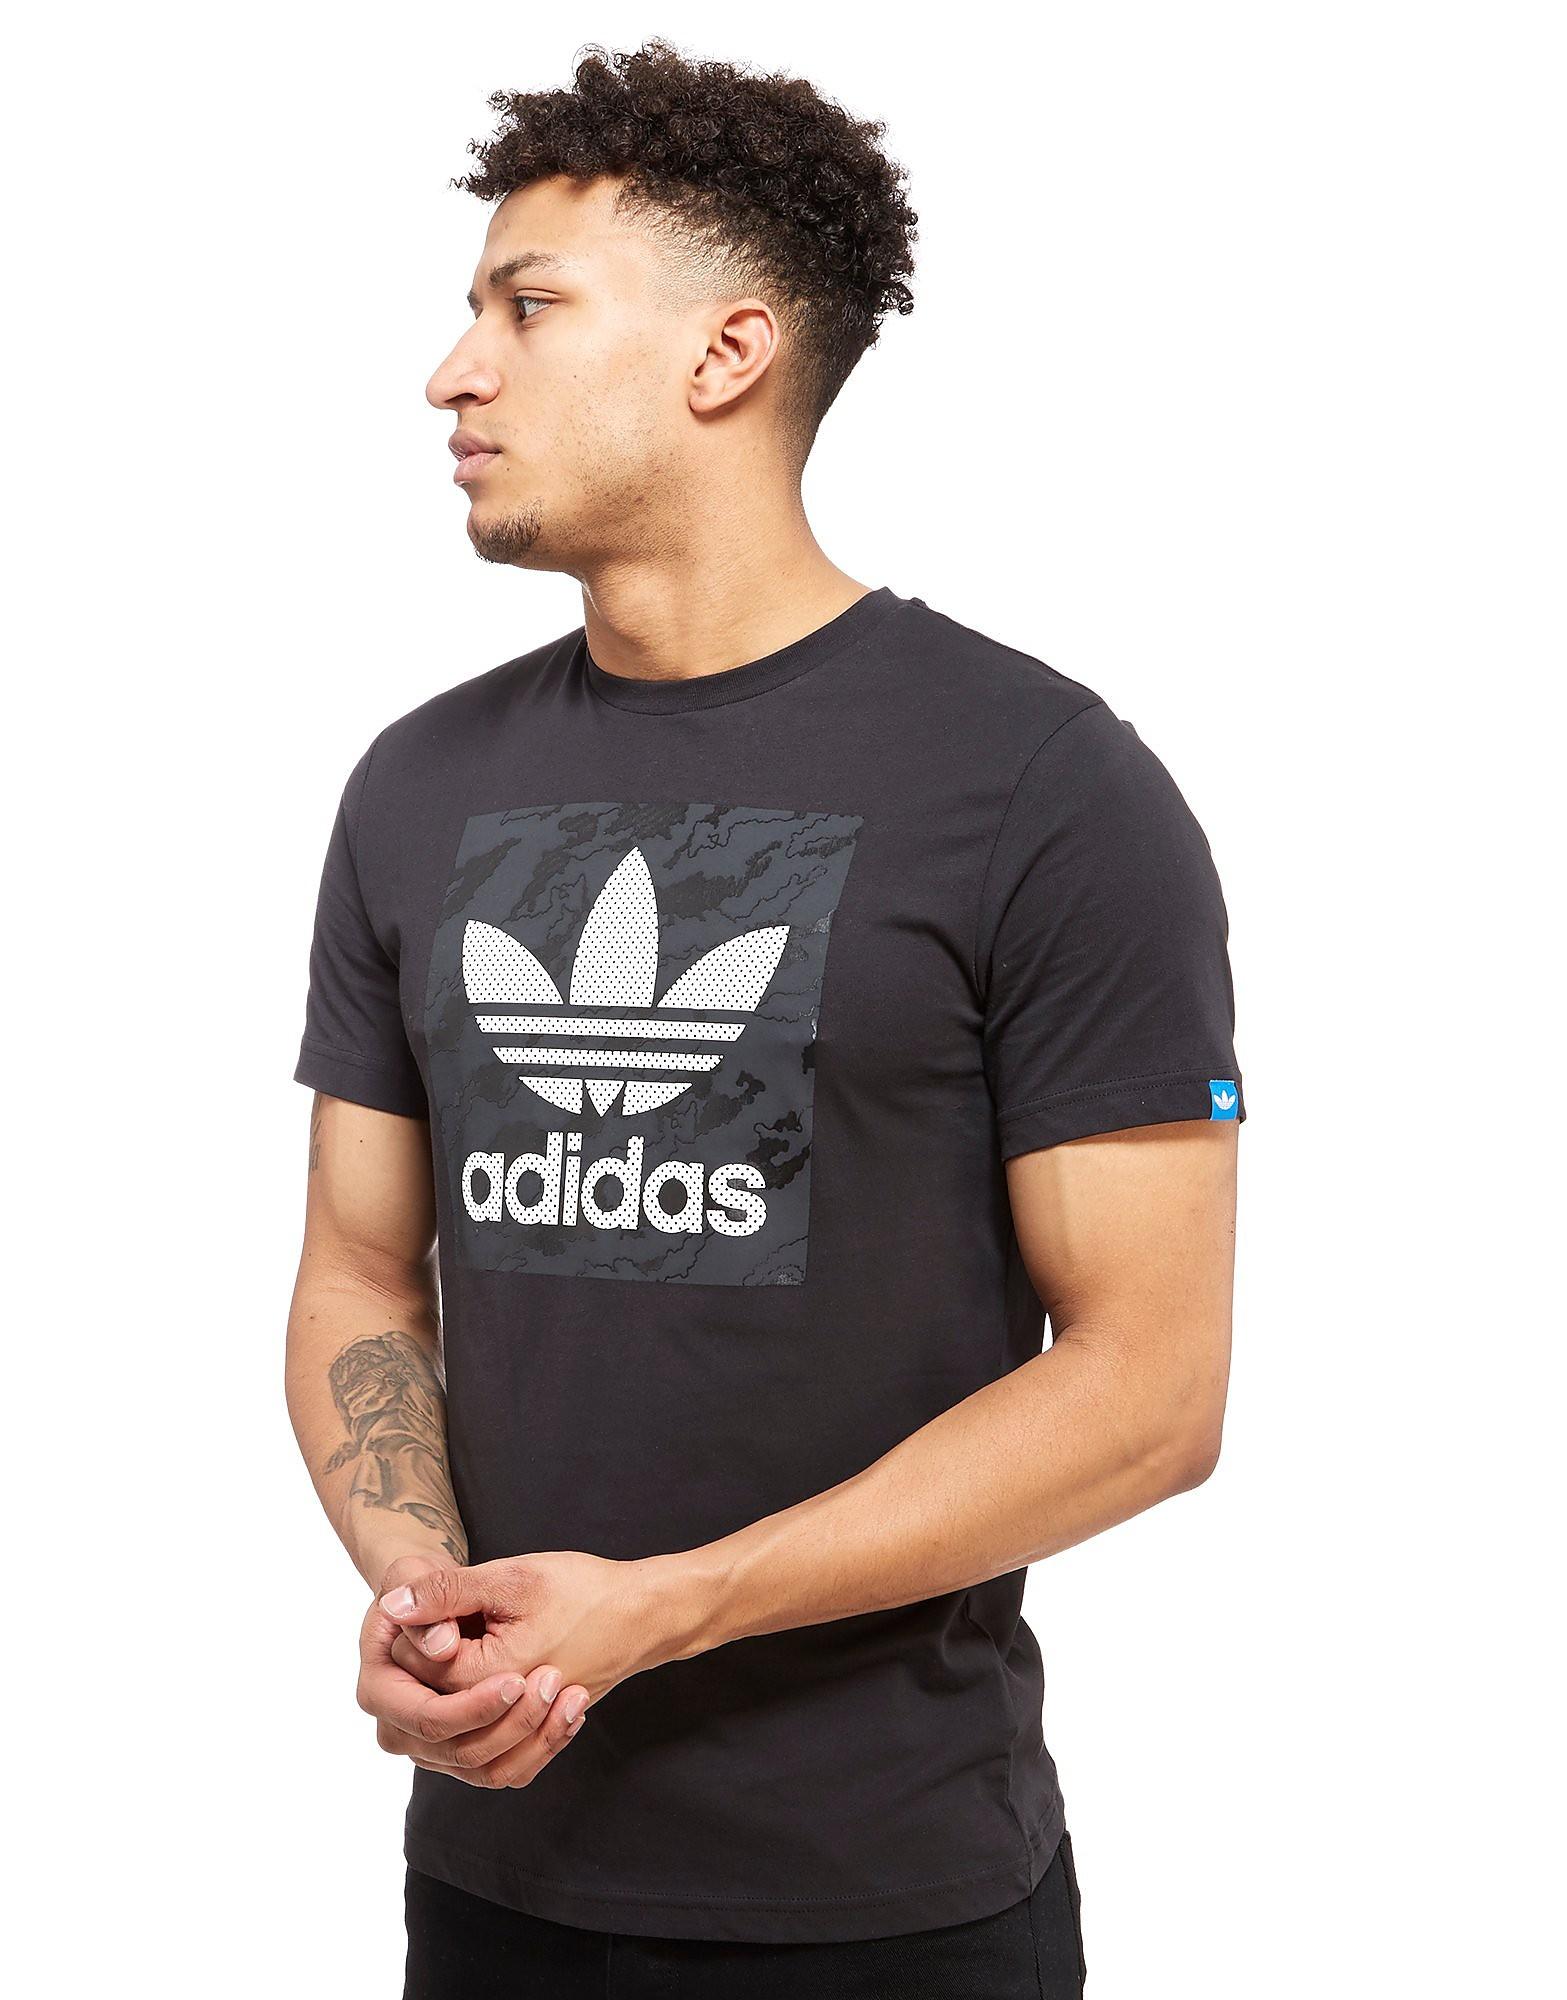 adidas Originals Street Running Camo T-Shirt